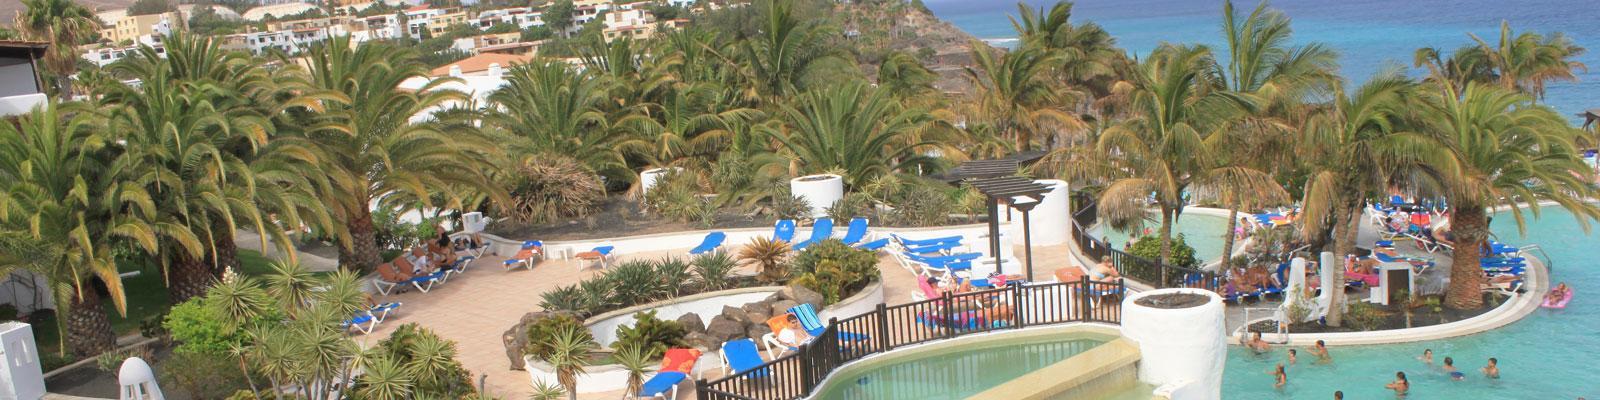 Club Jandia Princess - Fuerteventura Hotel